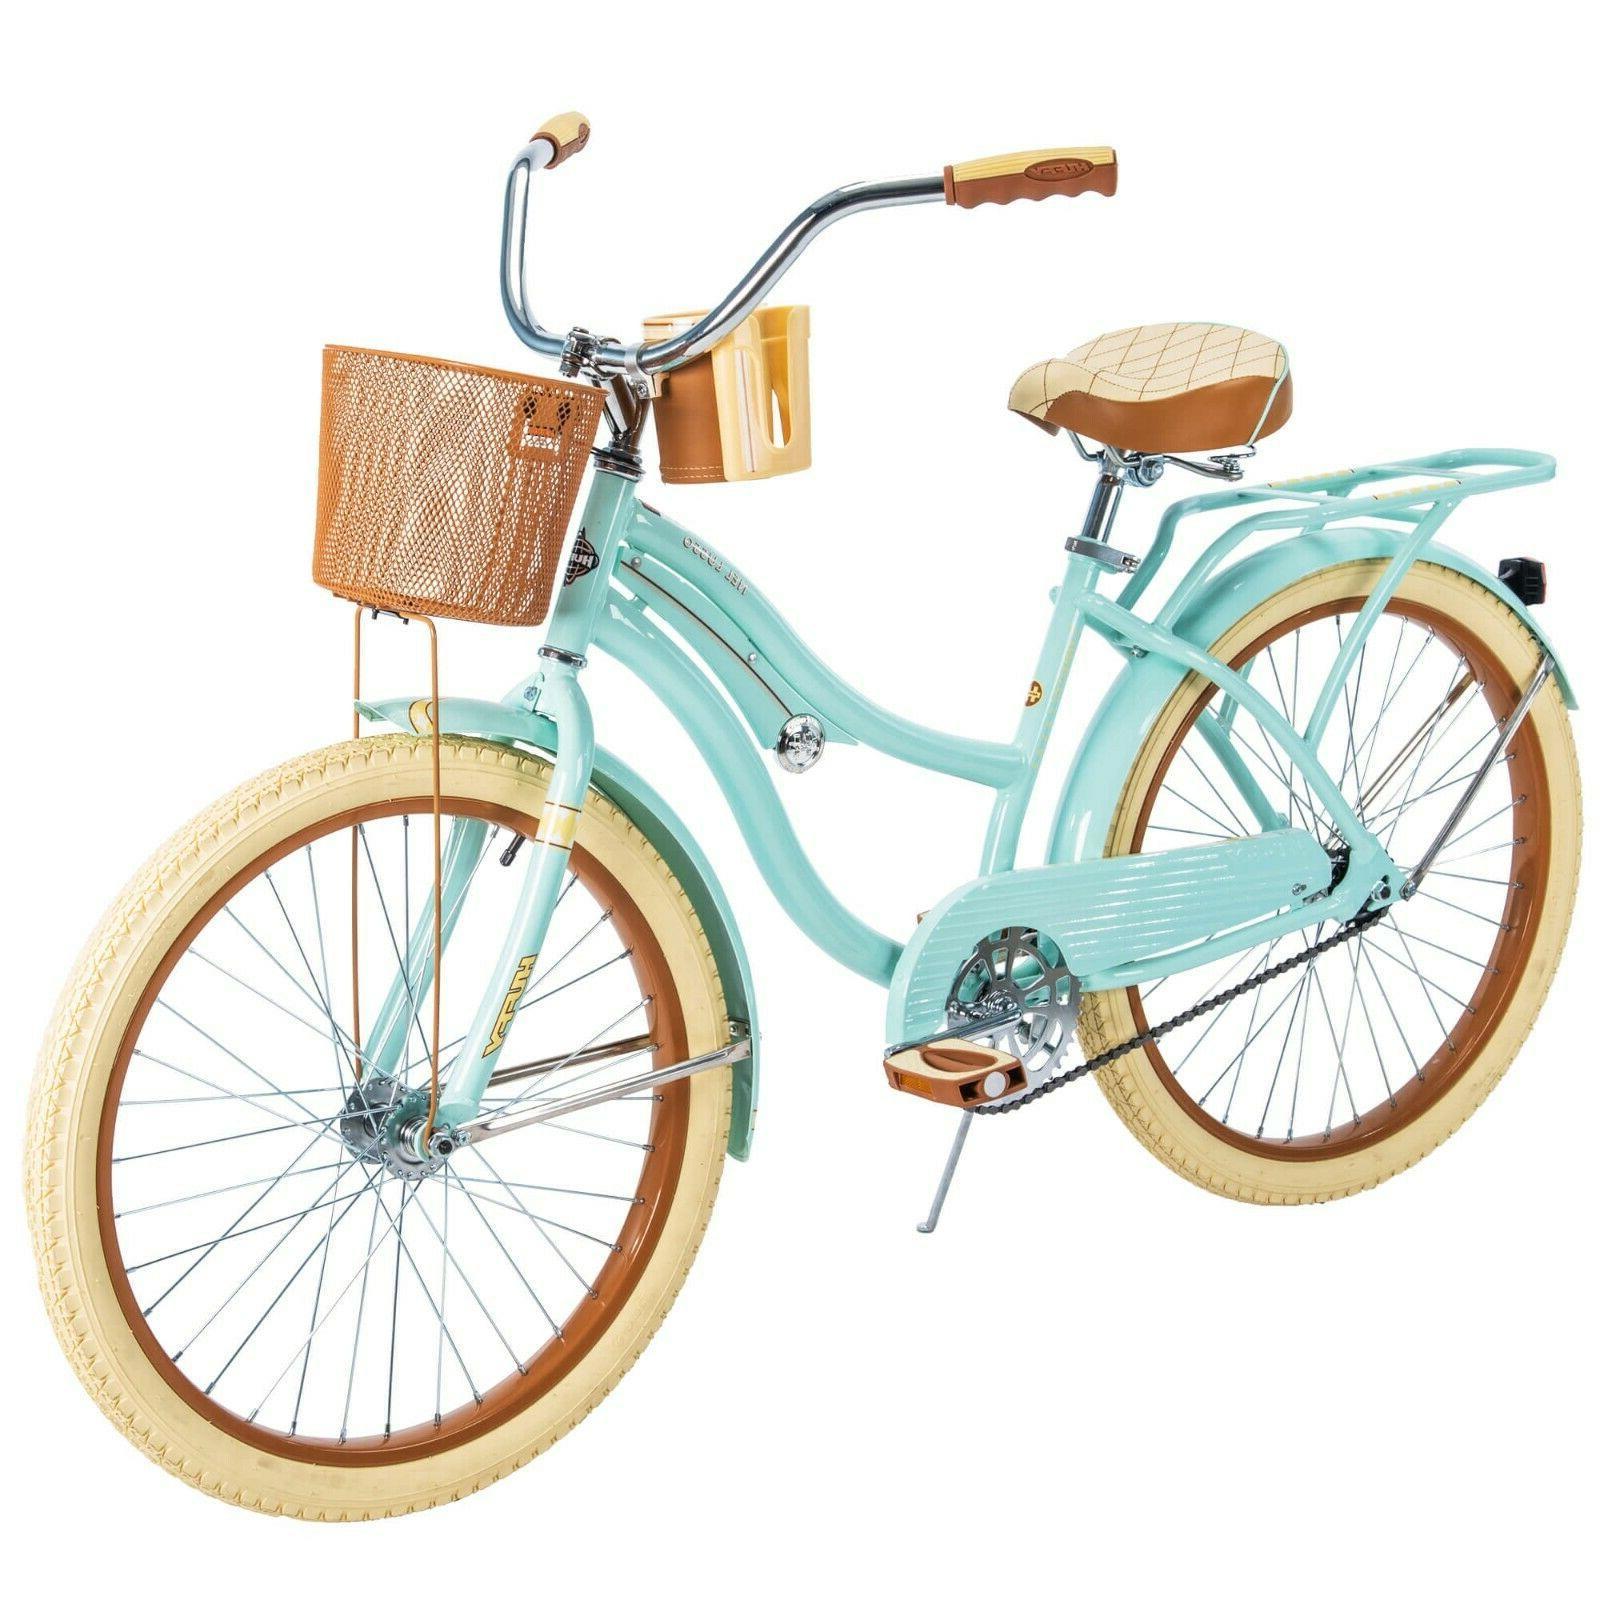 ✅BRAND NEW✅ Huffy Nel Lusso 24 inch Cruiser Bike - Mint